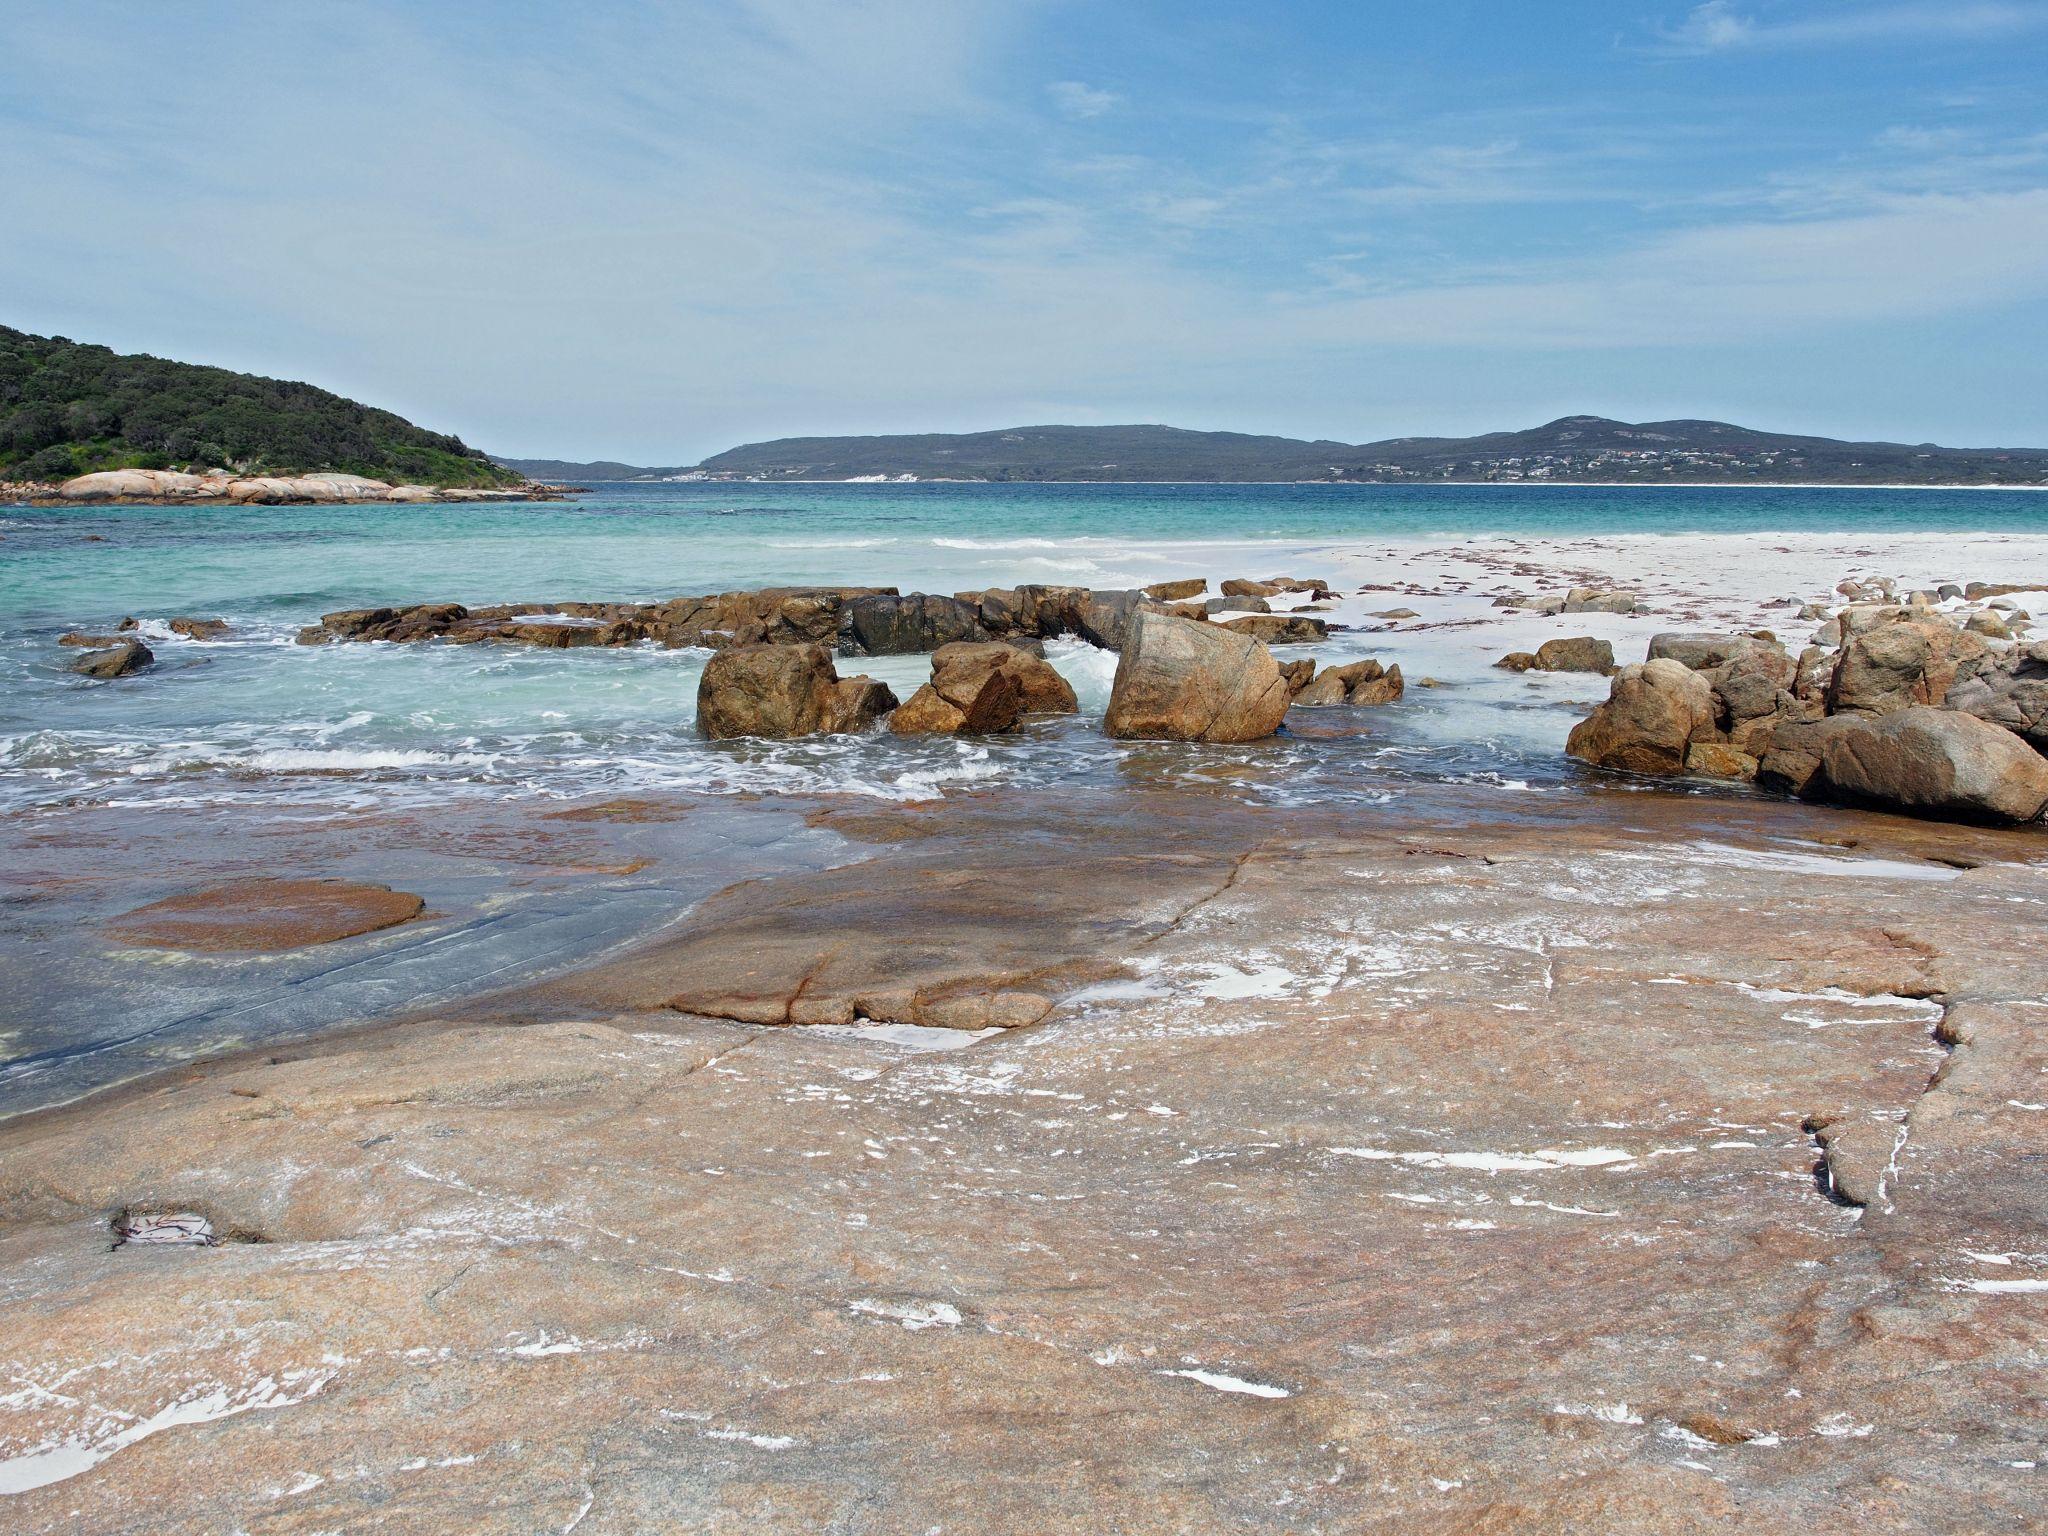 King George sound and Princess Royal Harbour, Australia